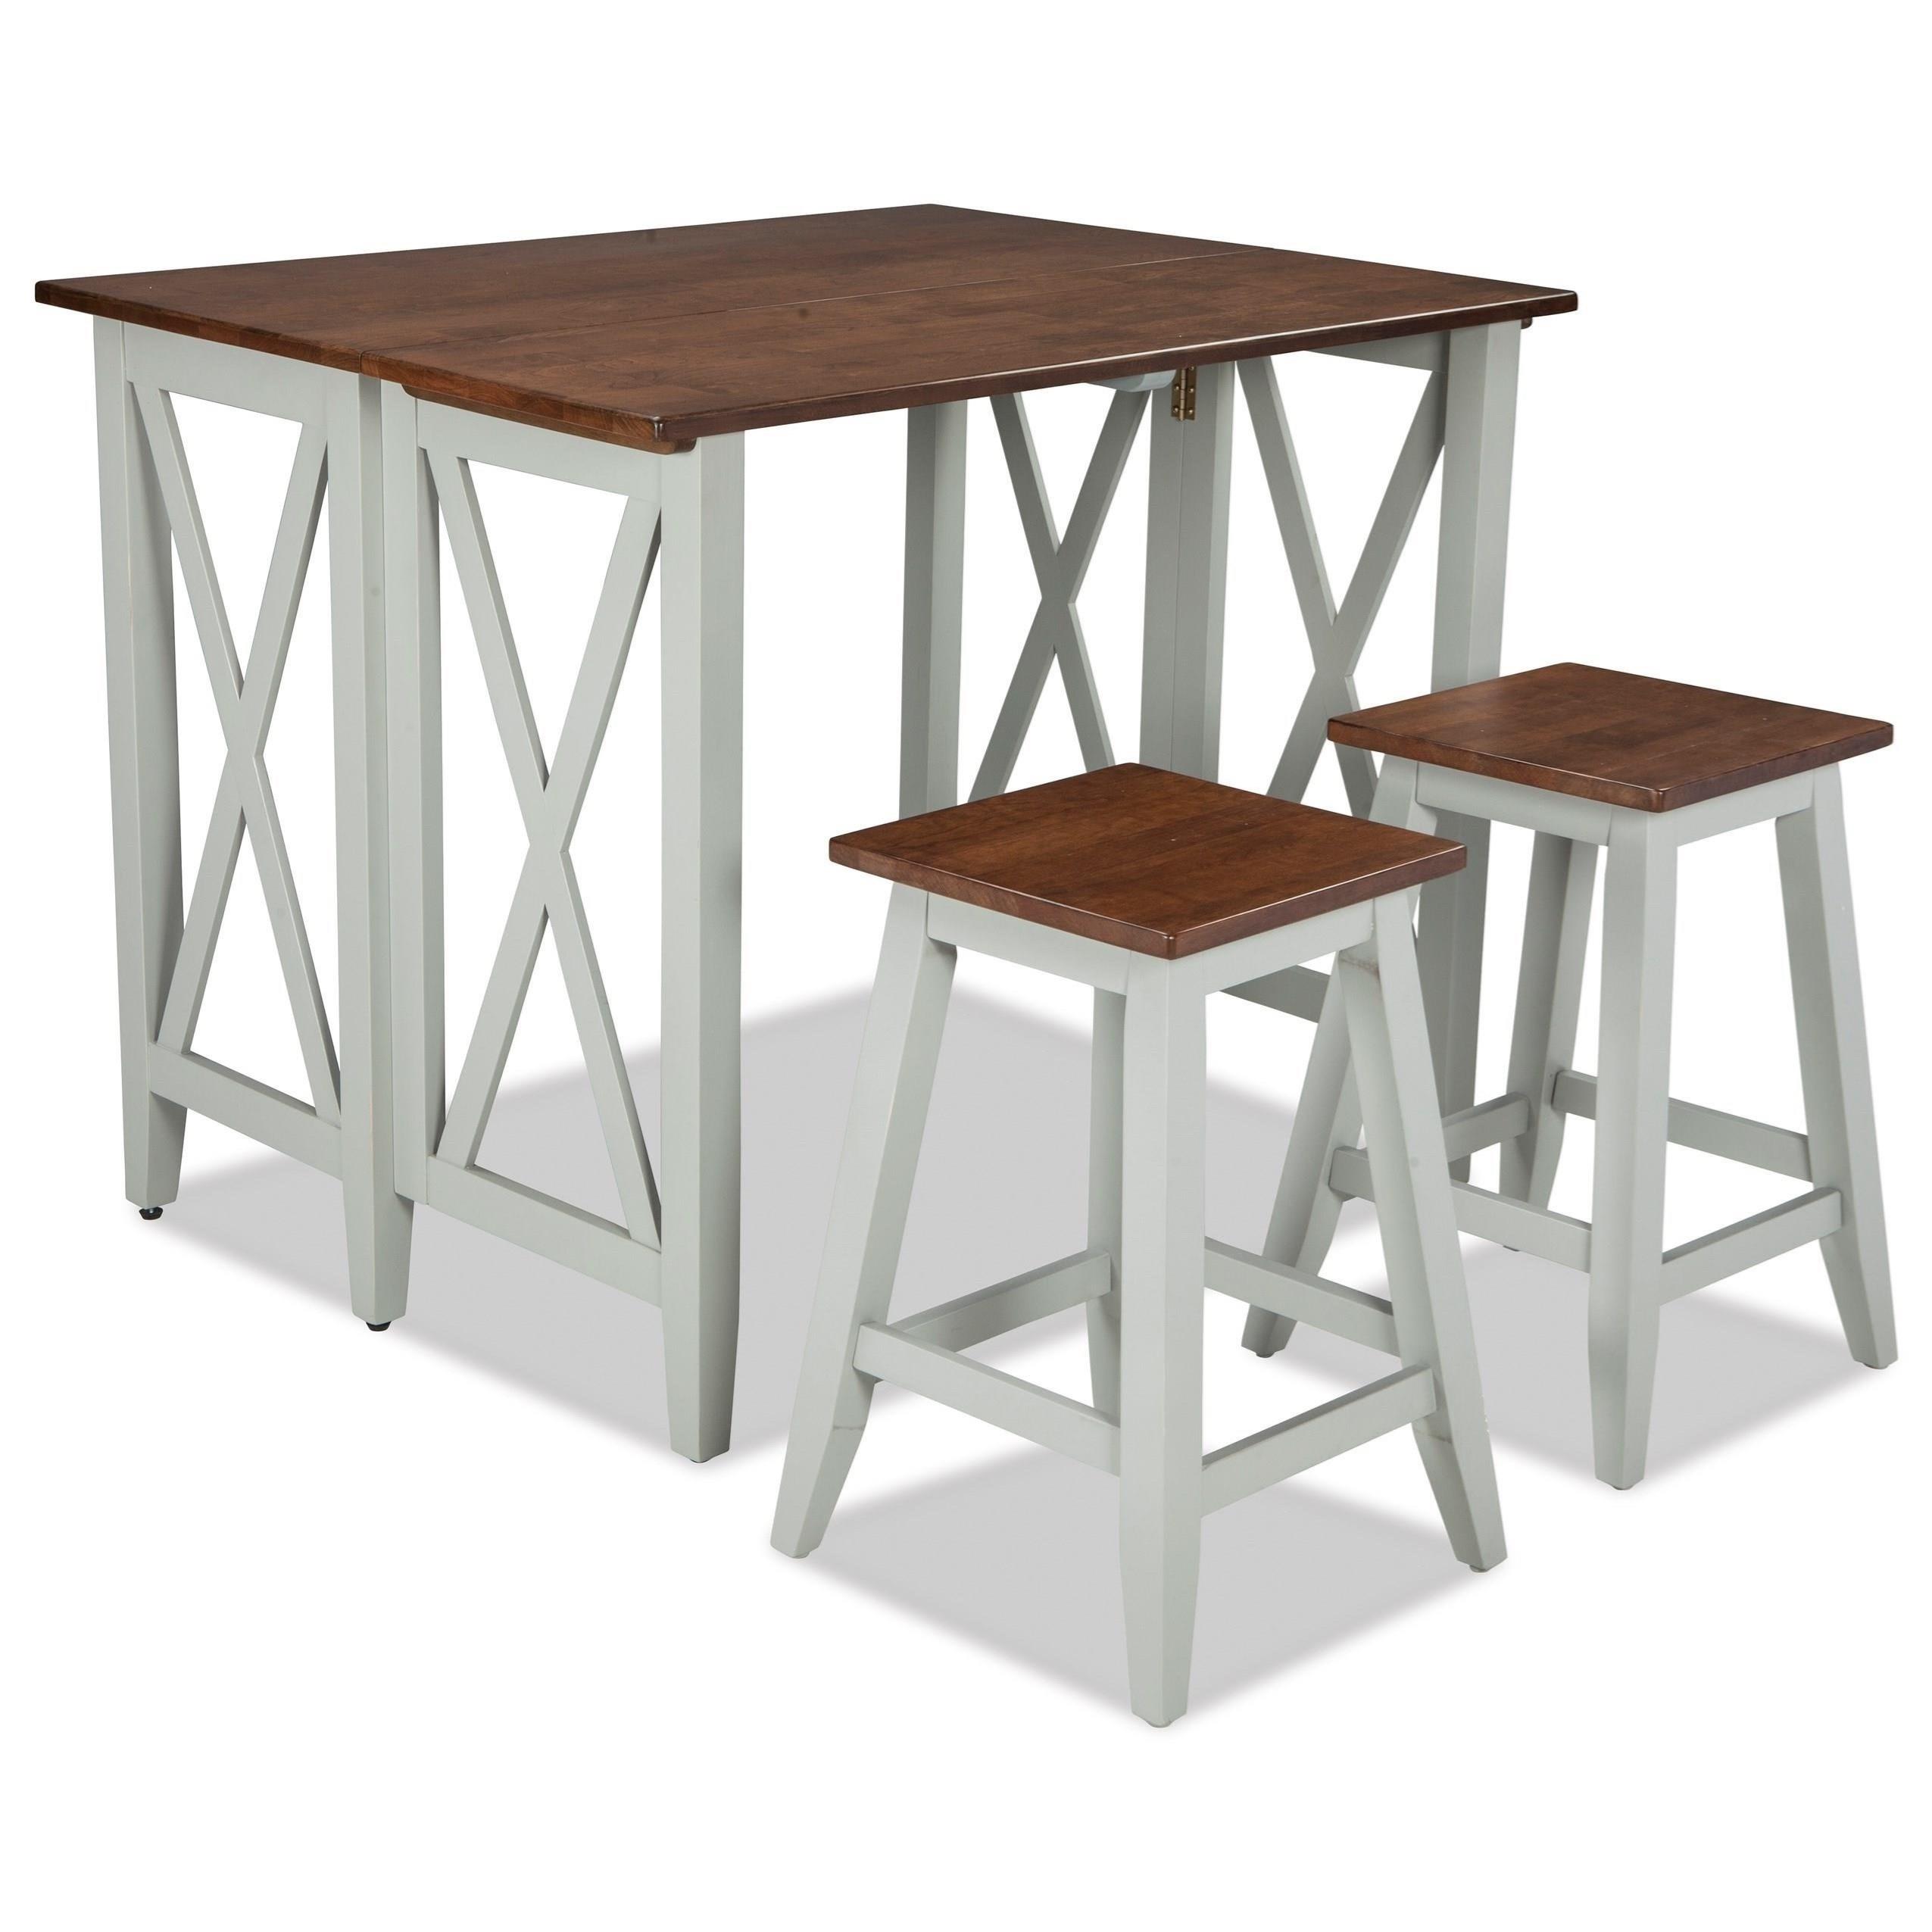 bar space listing zoom table saving fullxfull hejk drop il breakfast rustic leaf kitchen